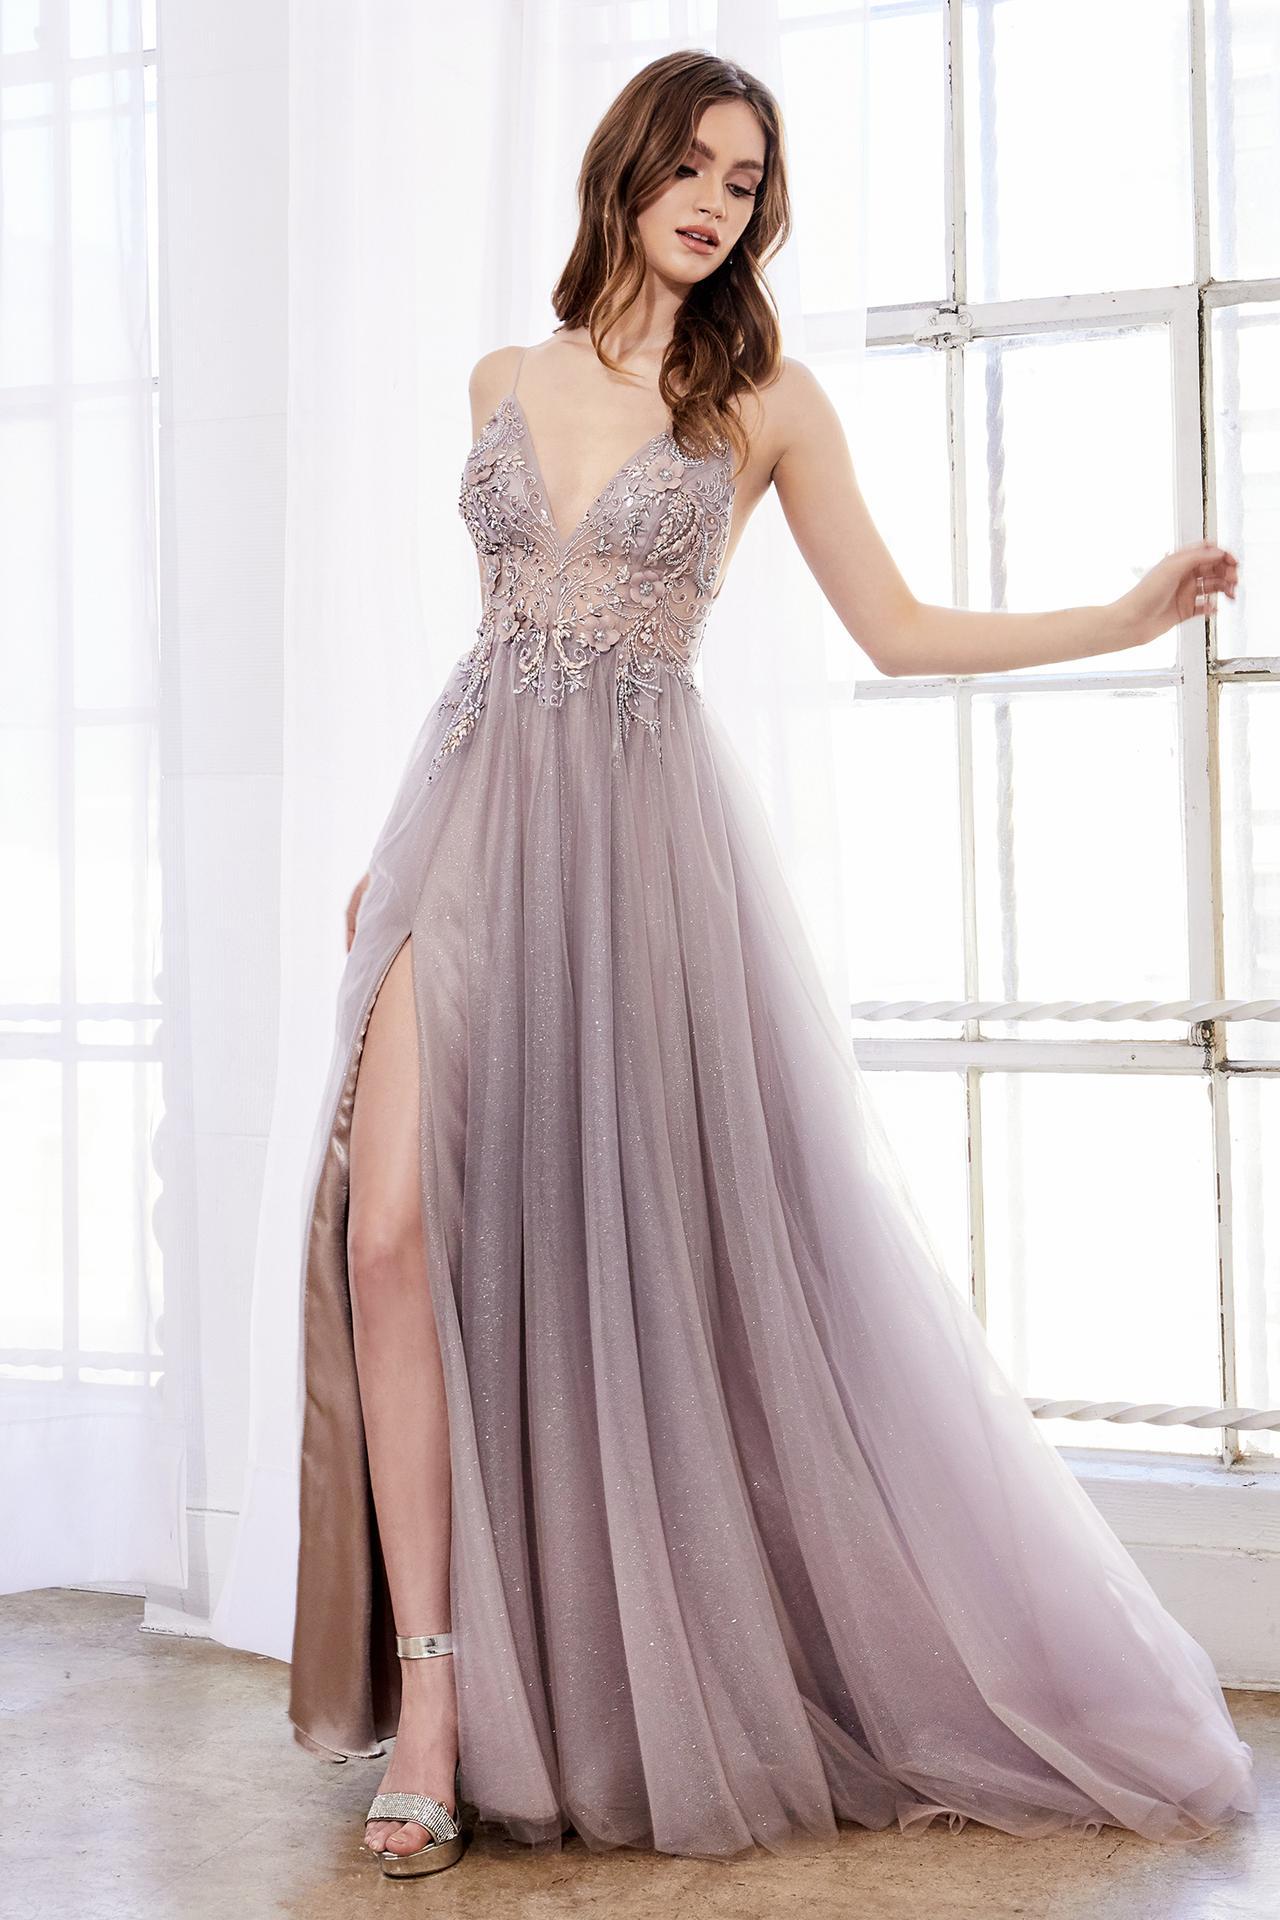 Nové spoločenské šaty :) - Obrázok č. 47